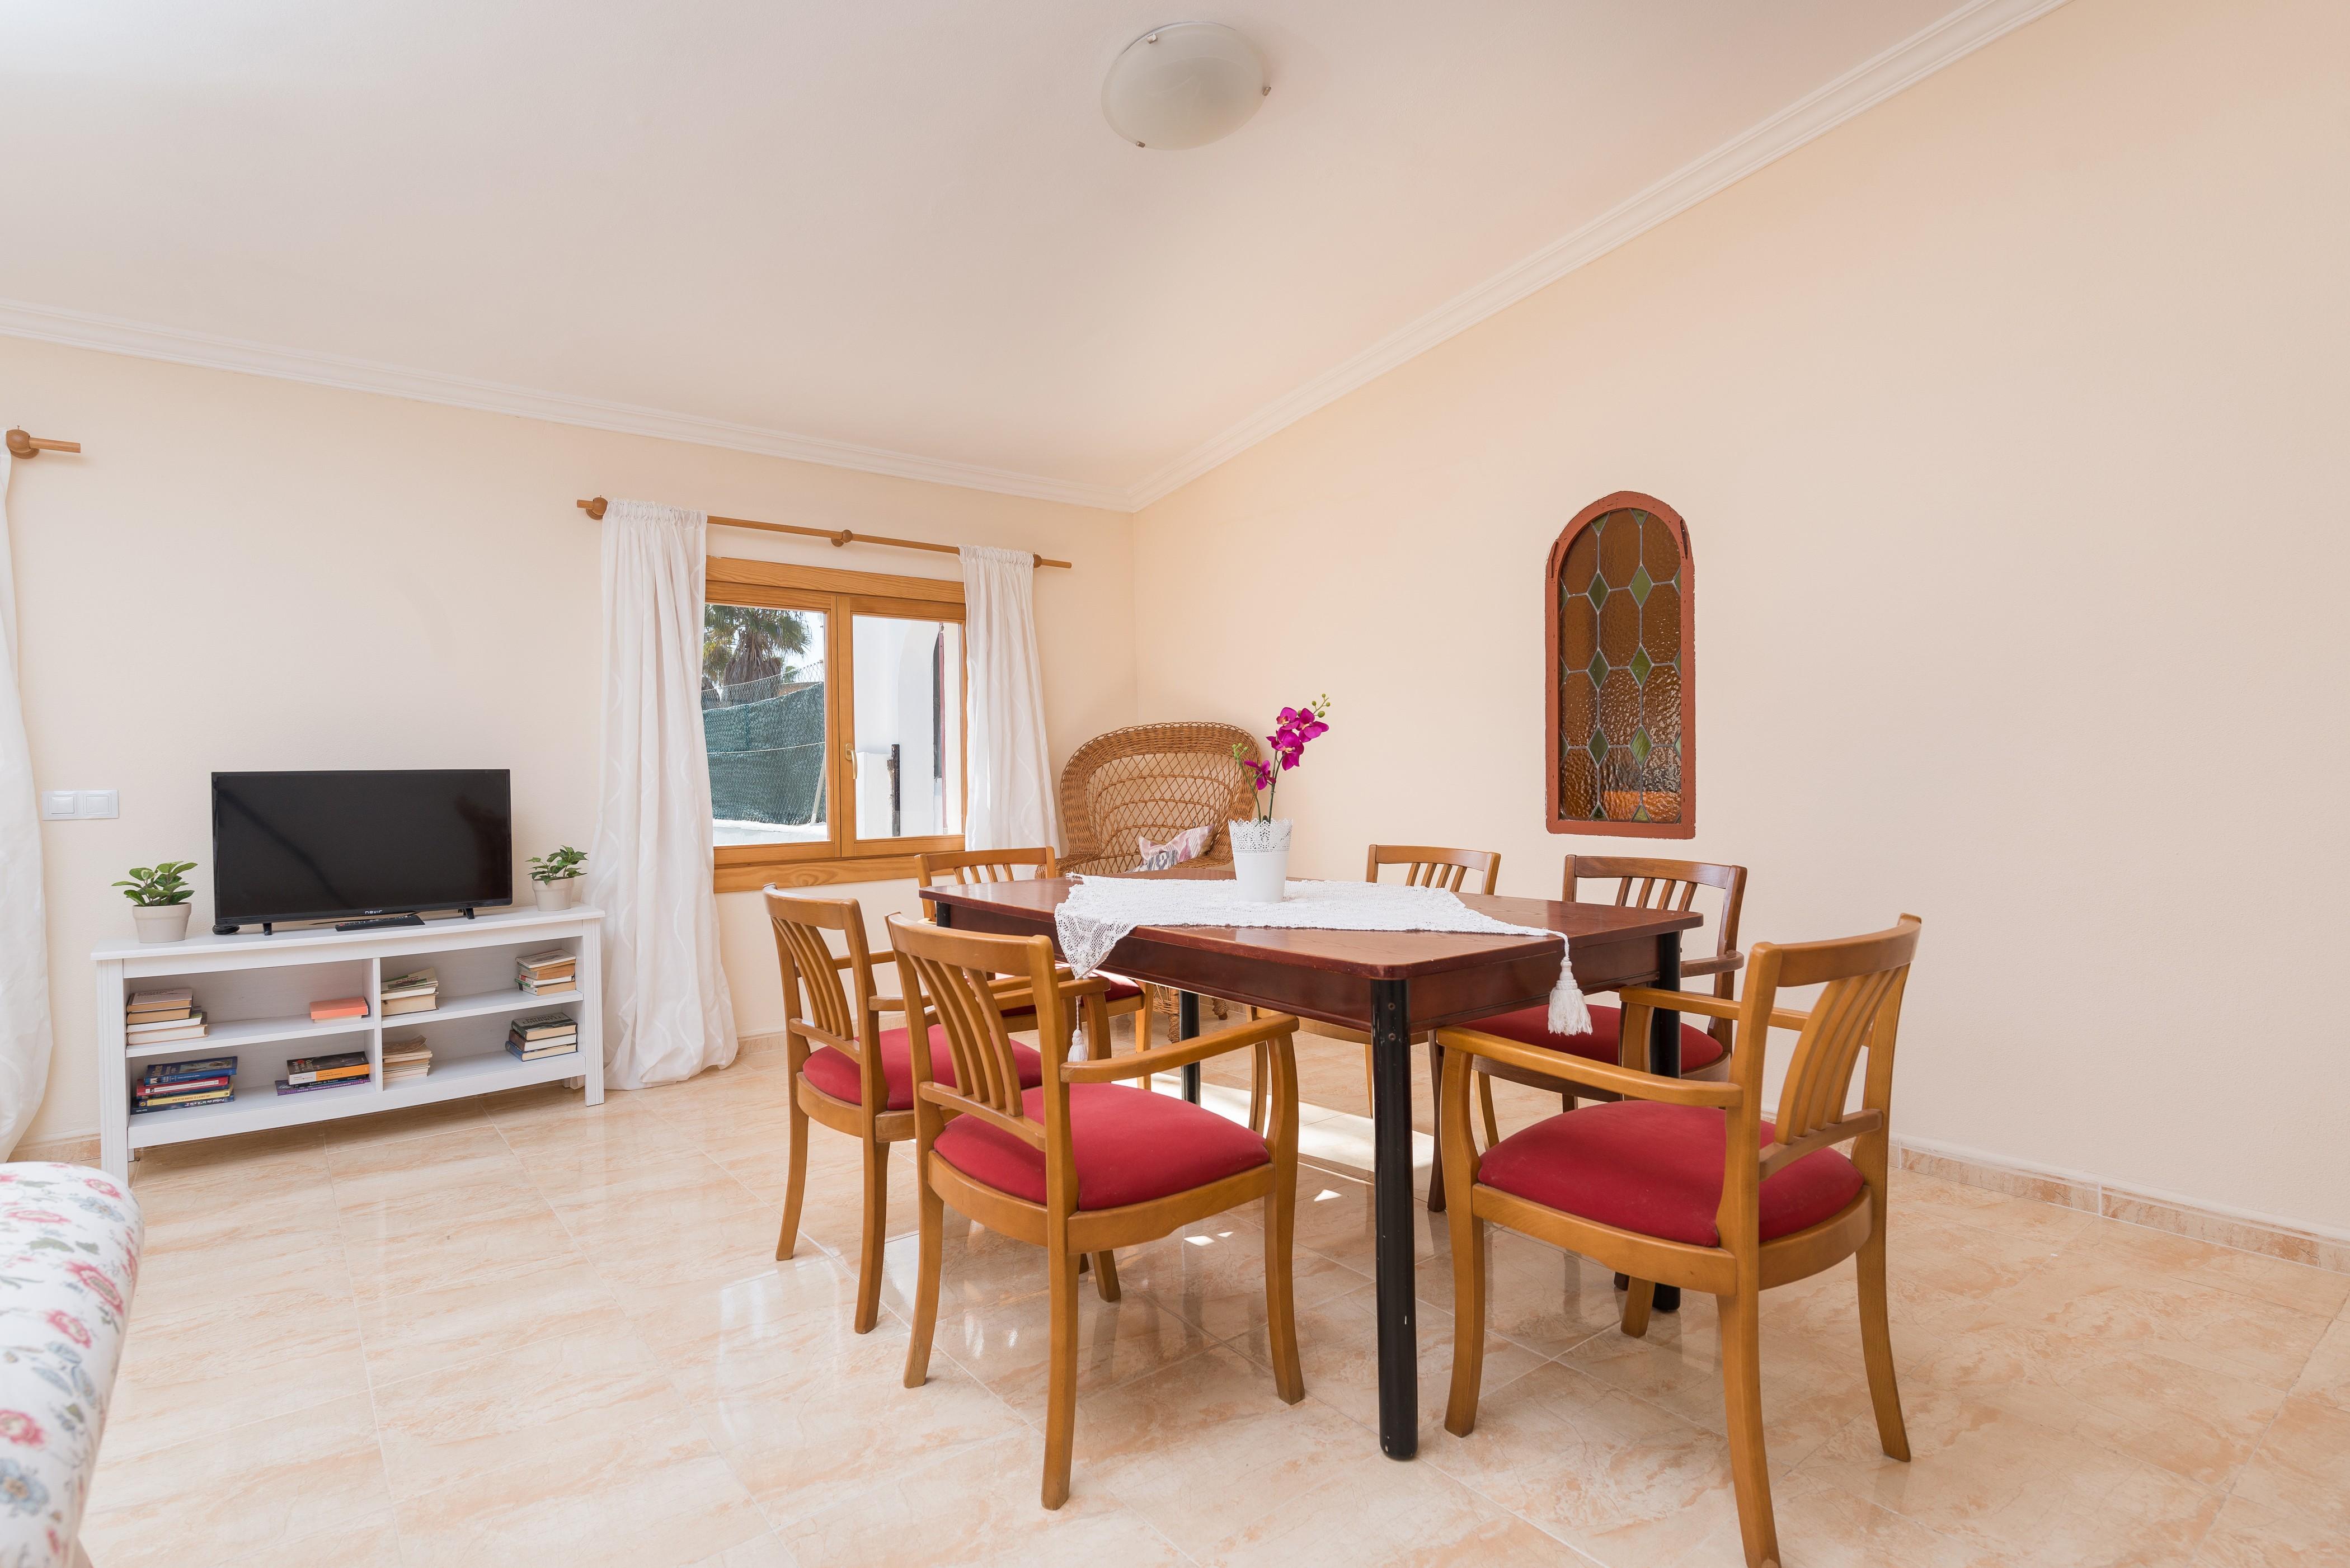 Ferienhaus CAN MOLINA (2063640), Cala Mandia, Mallorca, Balearische Inseln, Spanien, Bild 15